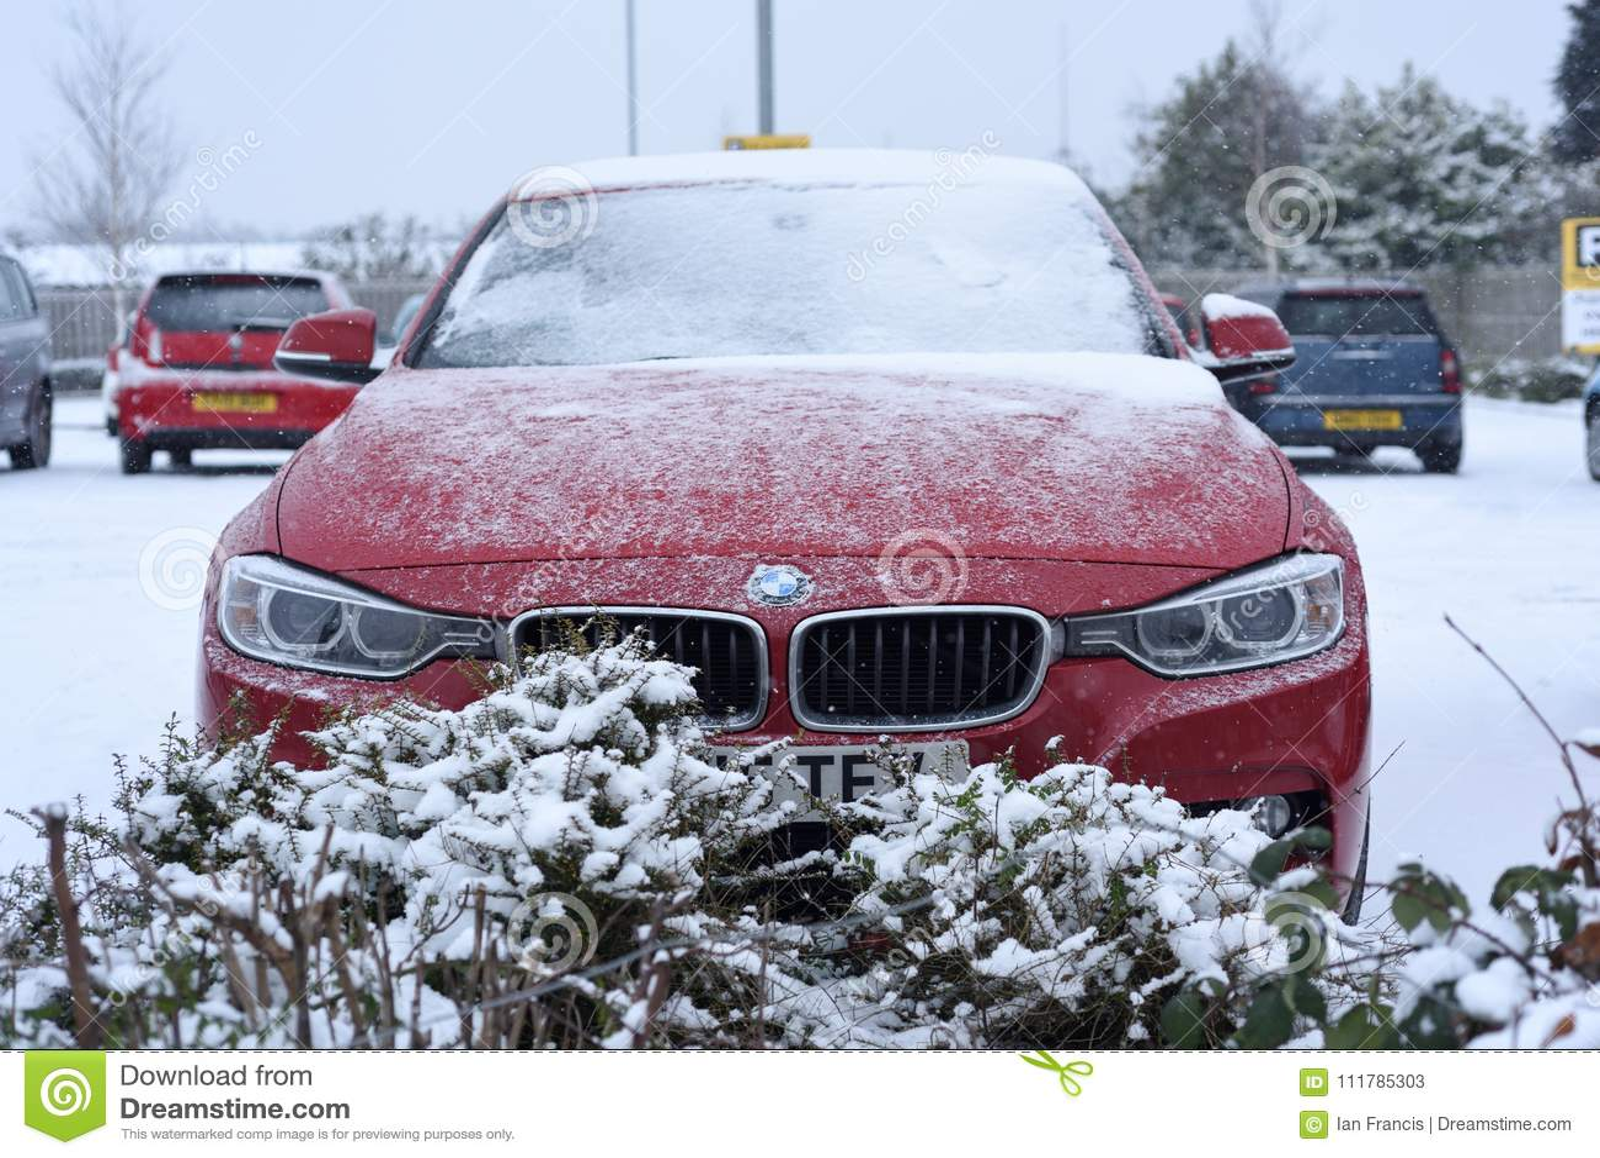 Heavy Snowfall in the UK